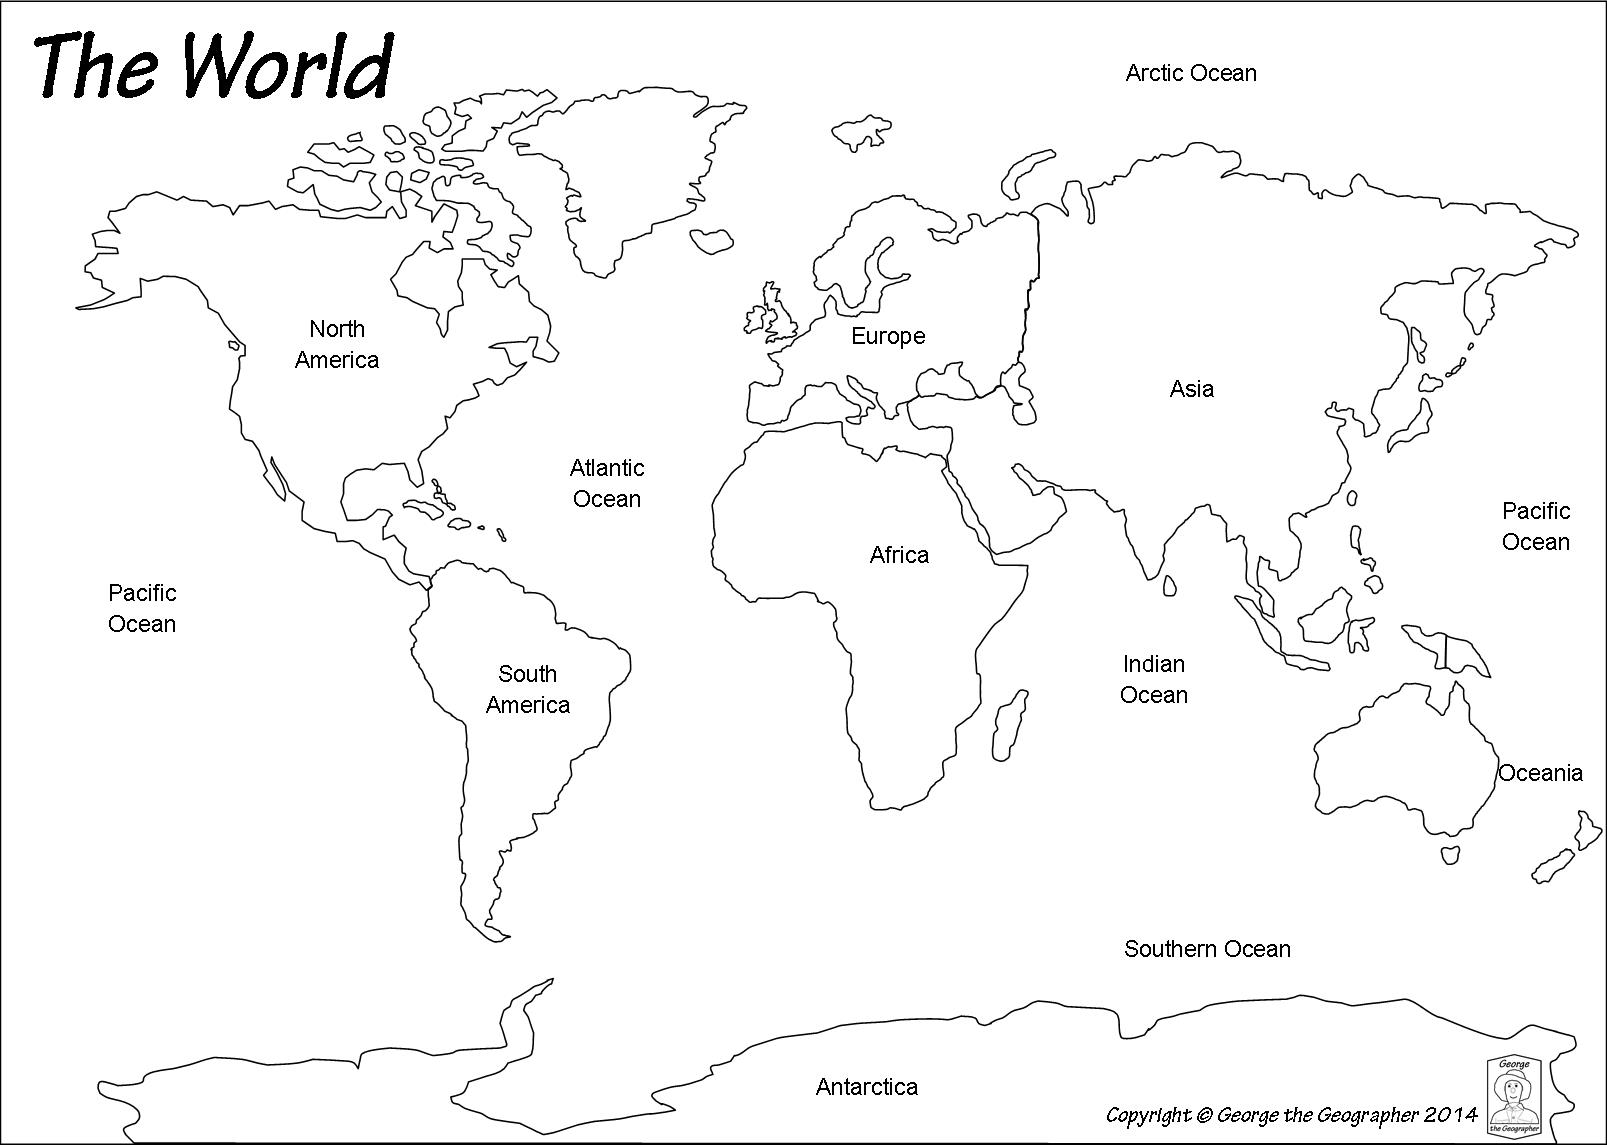 World map clipart uship picture transparent download World map forests clipart - ClipartFest picture transparent download